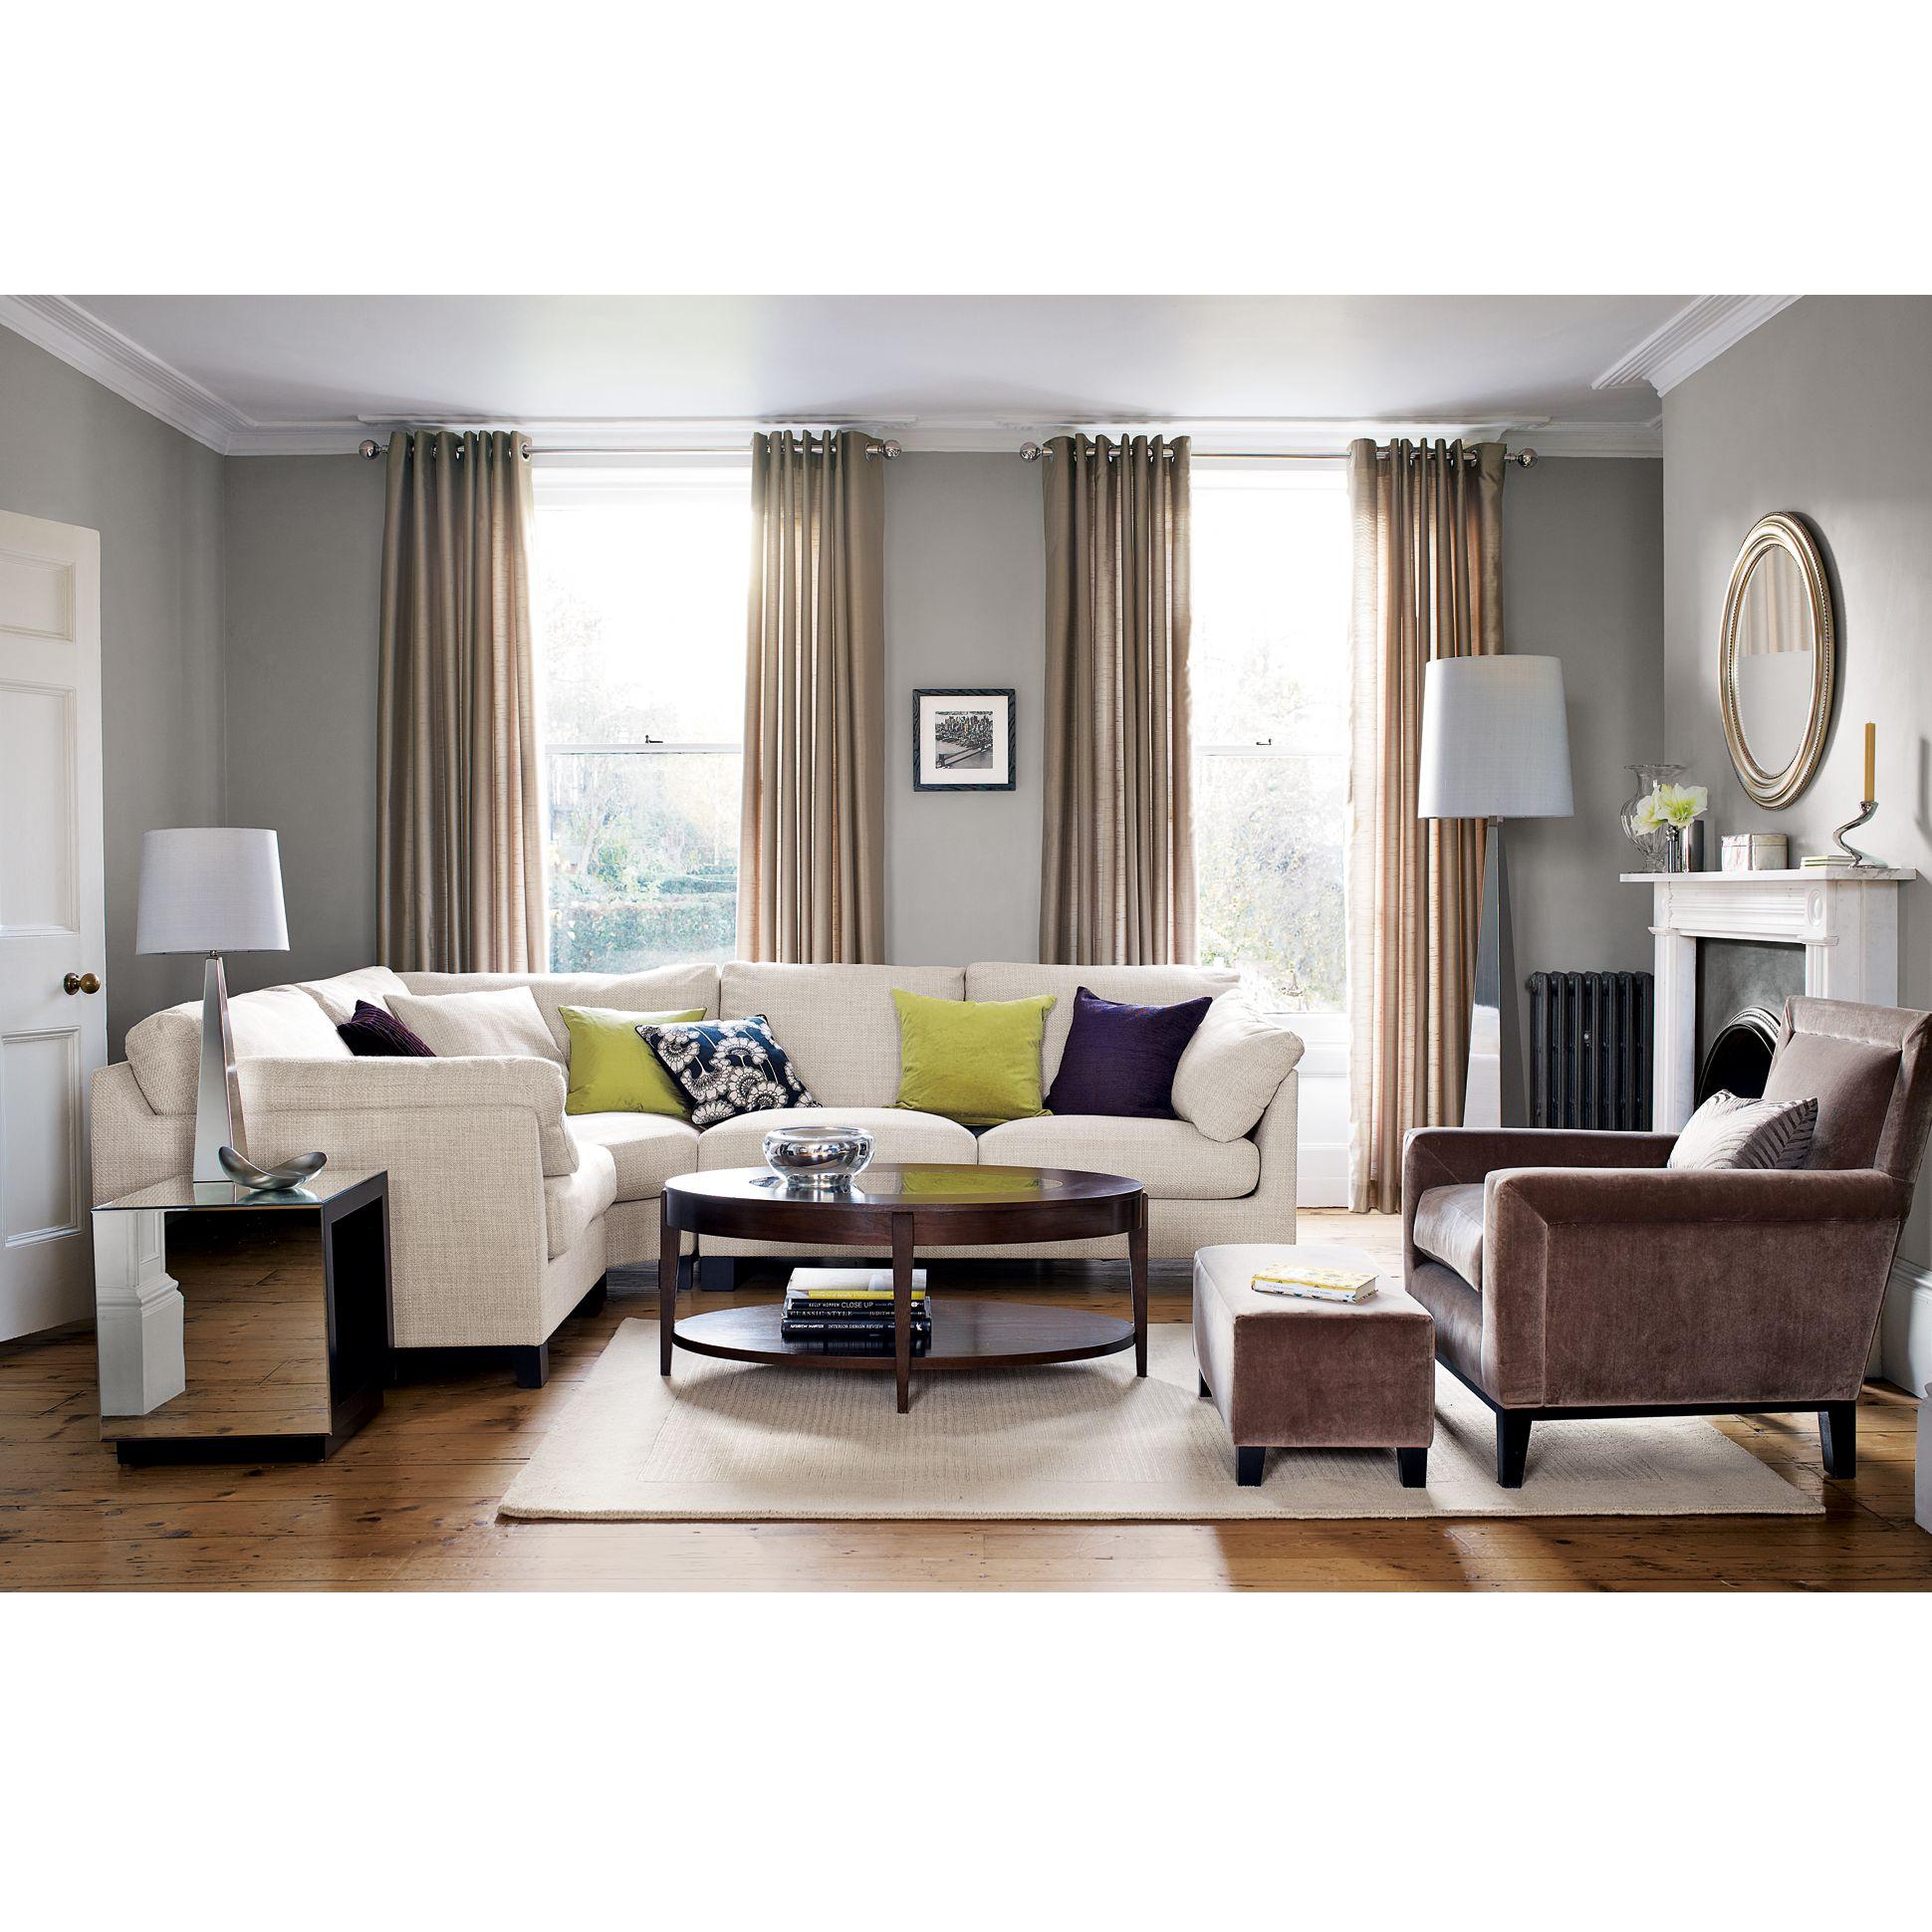 john lewis living room designs photo - 2